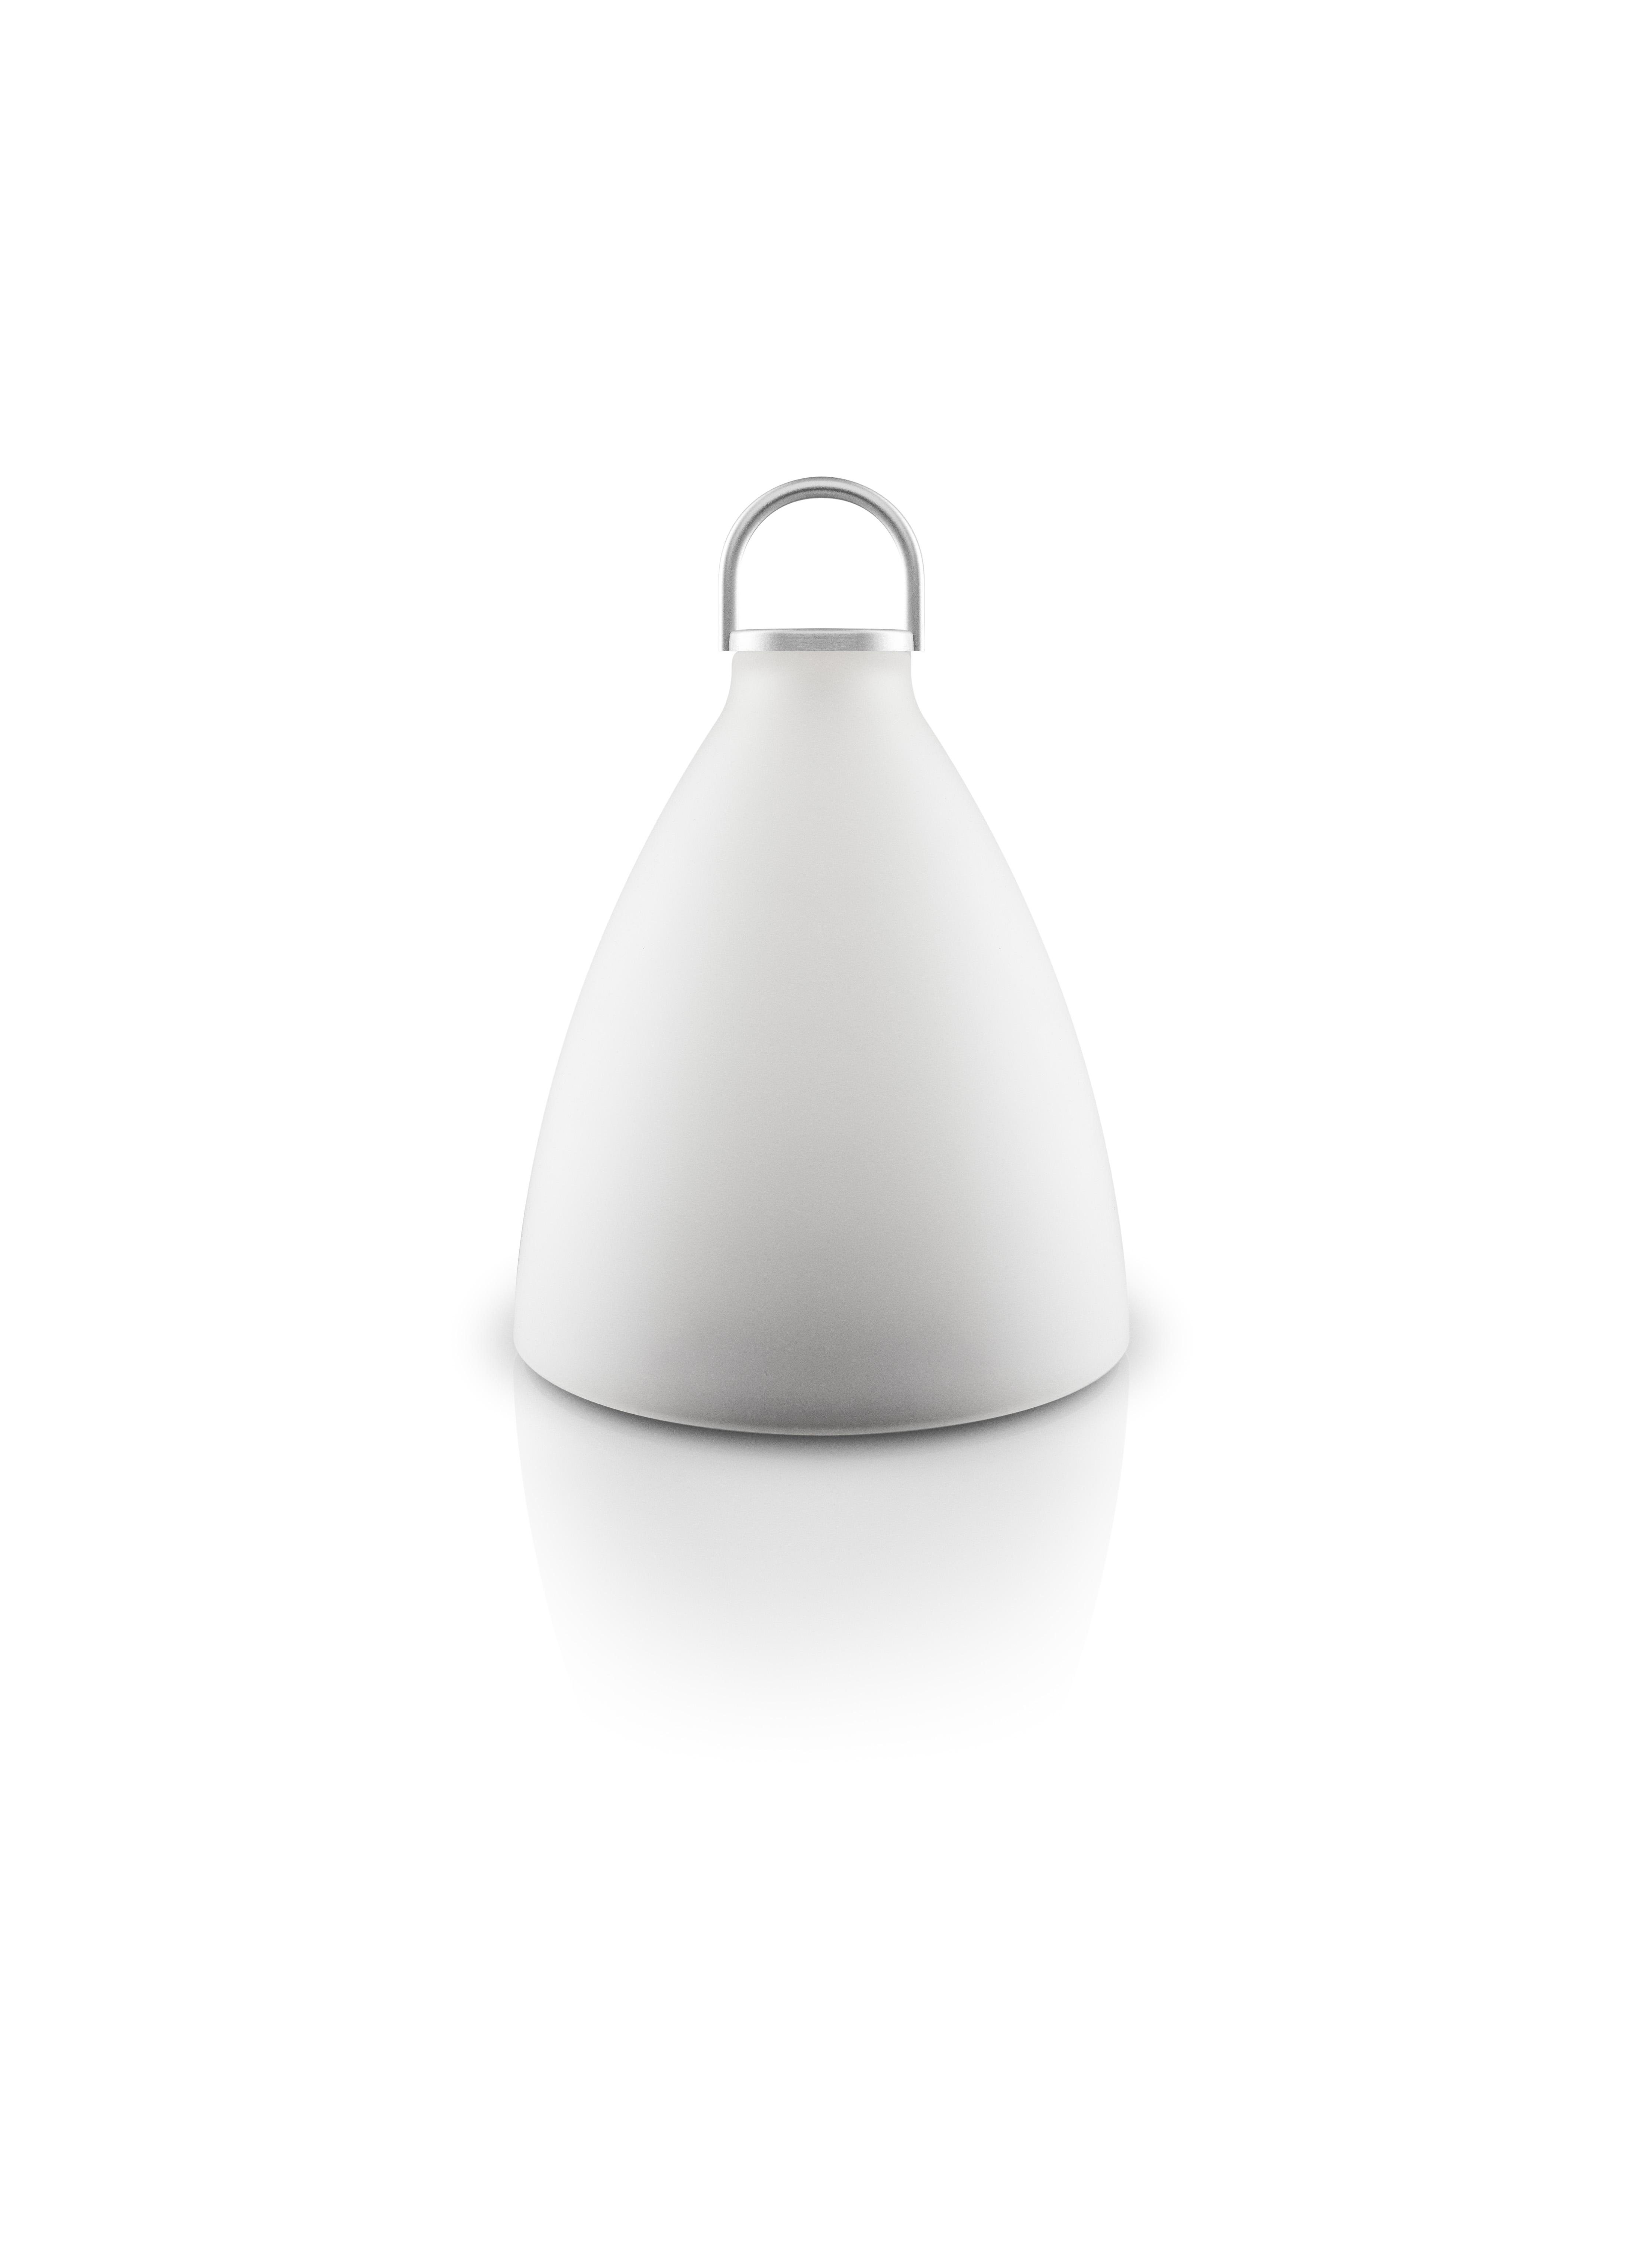 Eva Solo - SunLight Bell Lampe klein (571327)